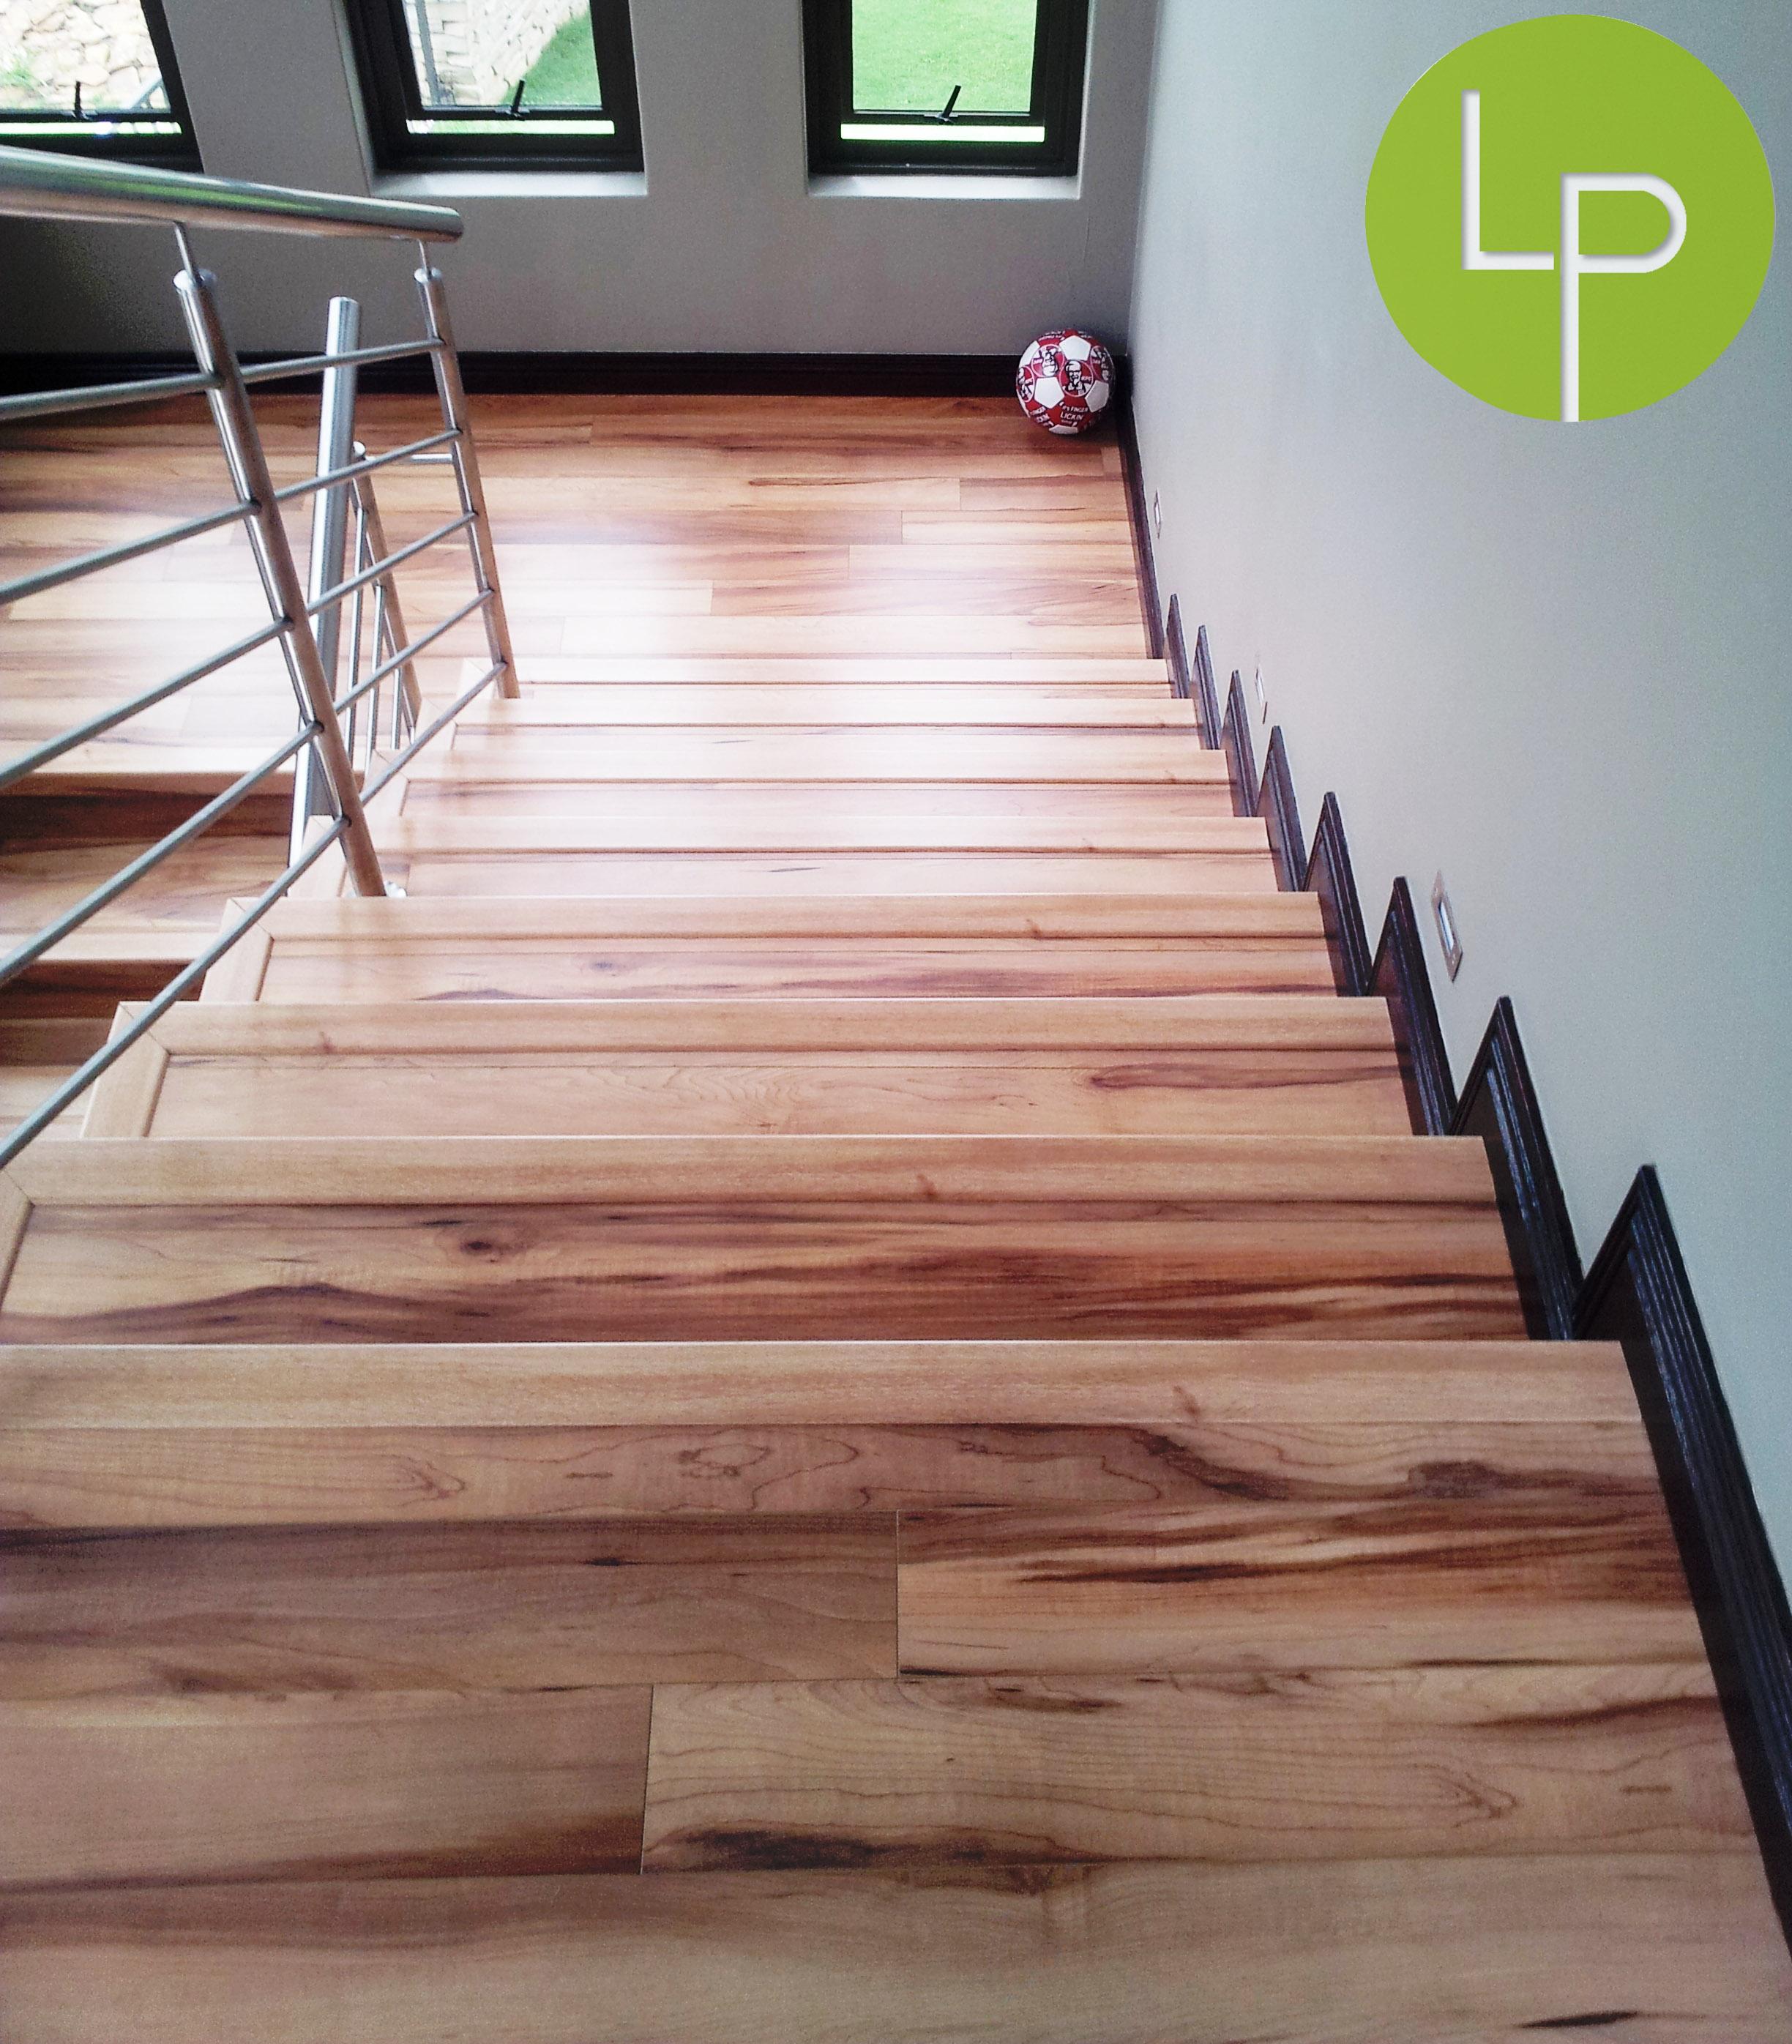 LemonPeppa-Flooring